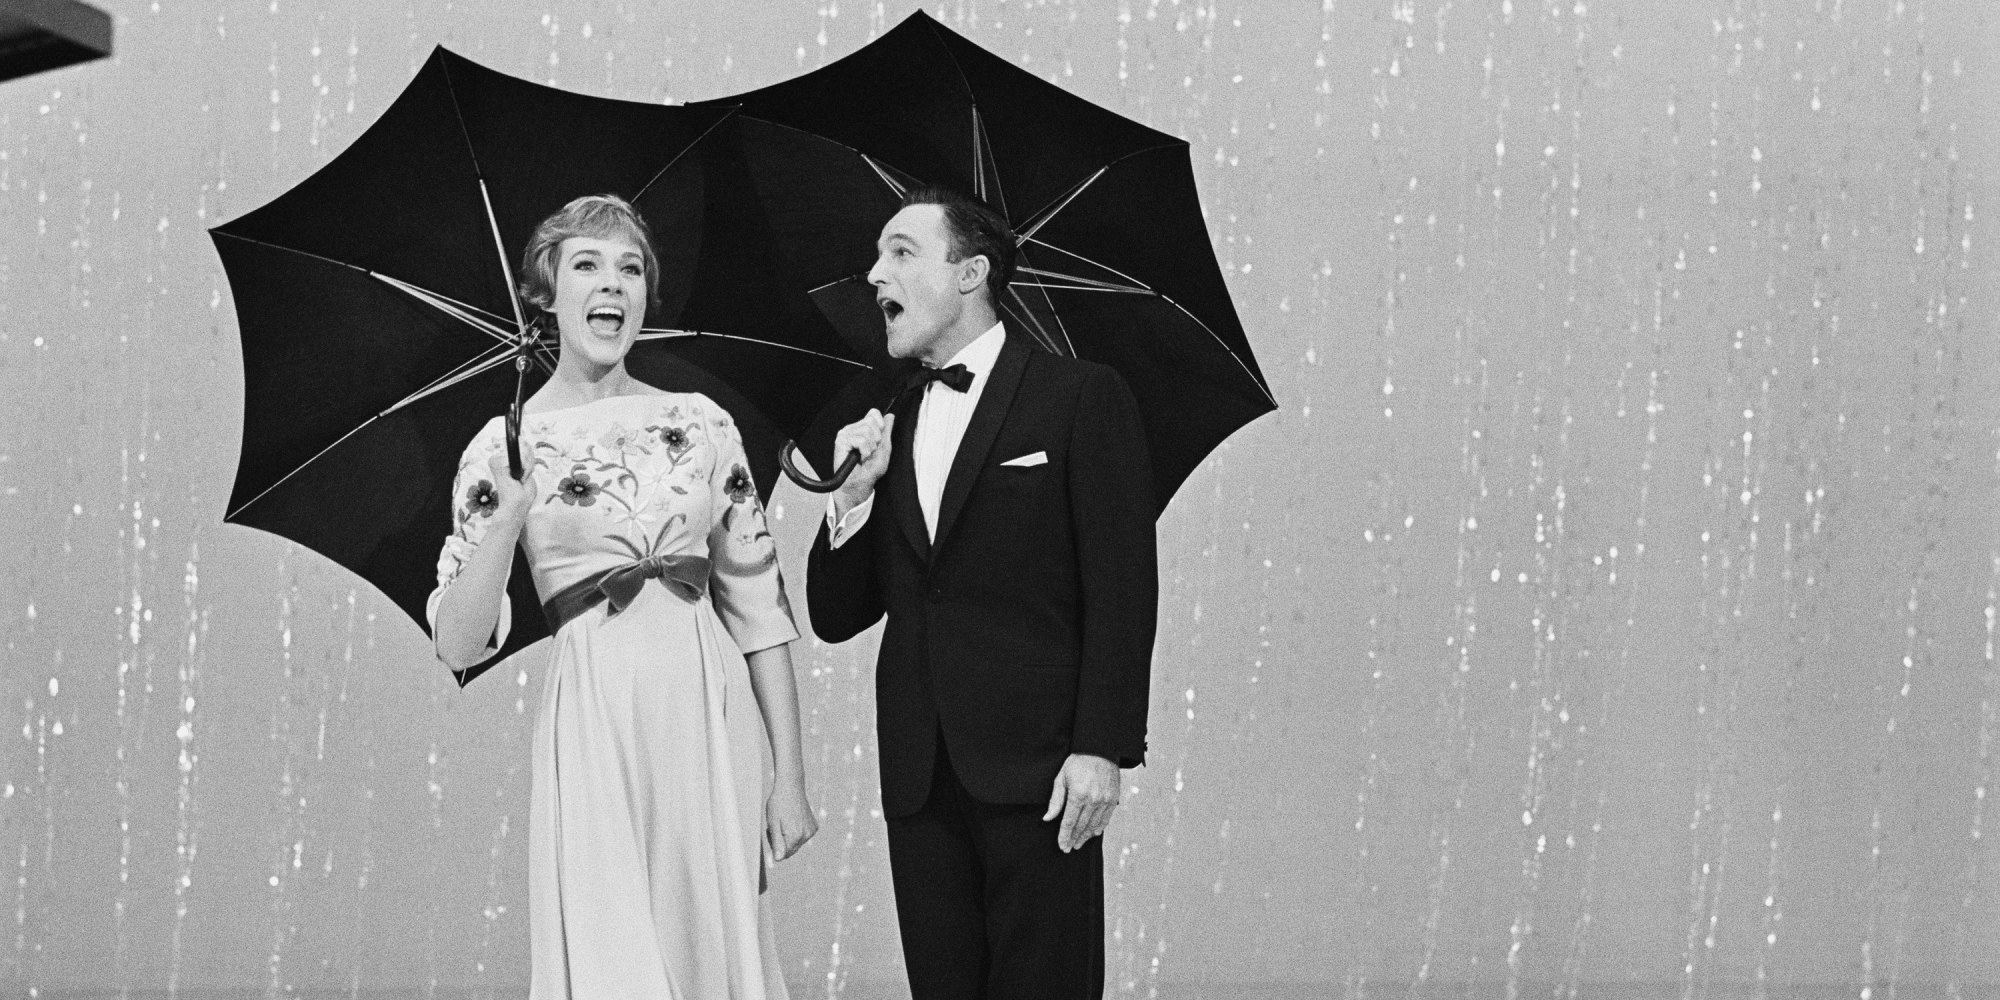 Gene Kelly and Julie Andrews